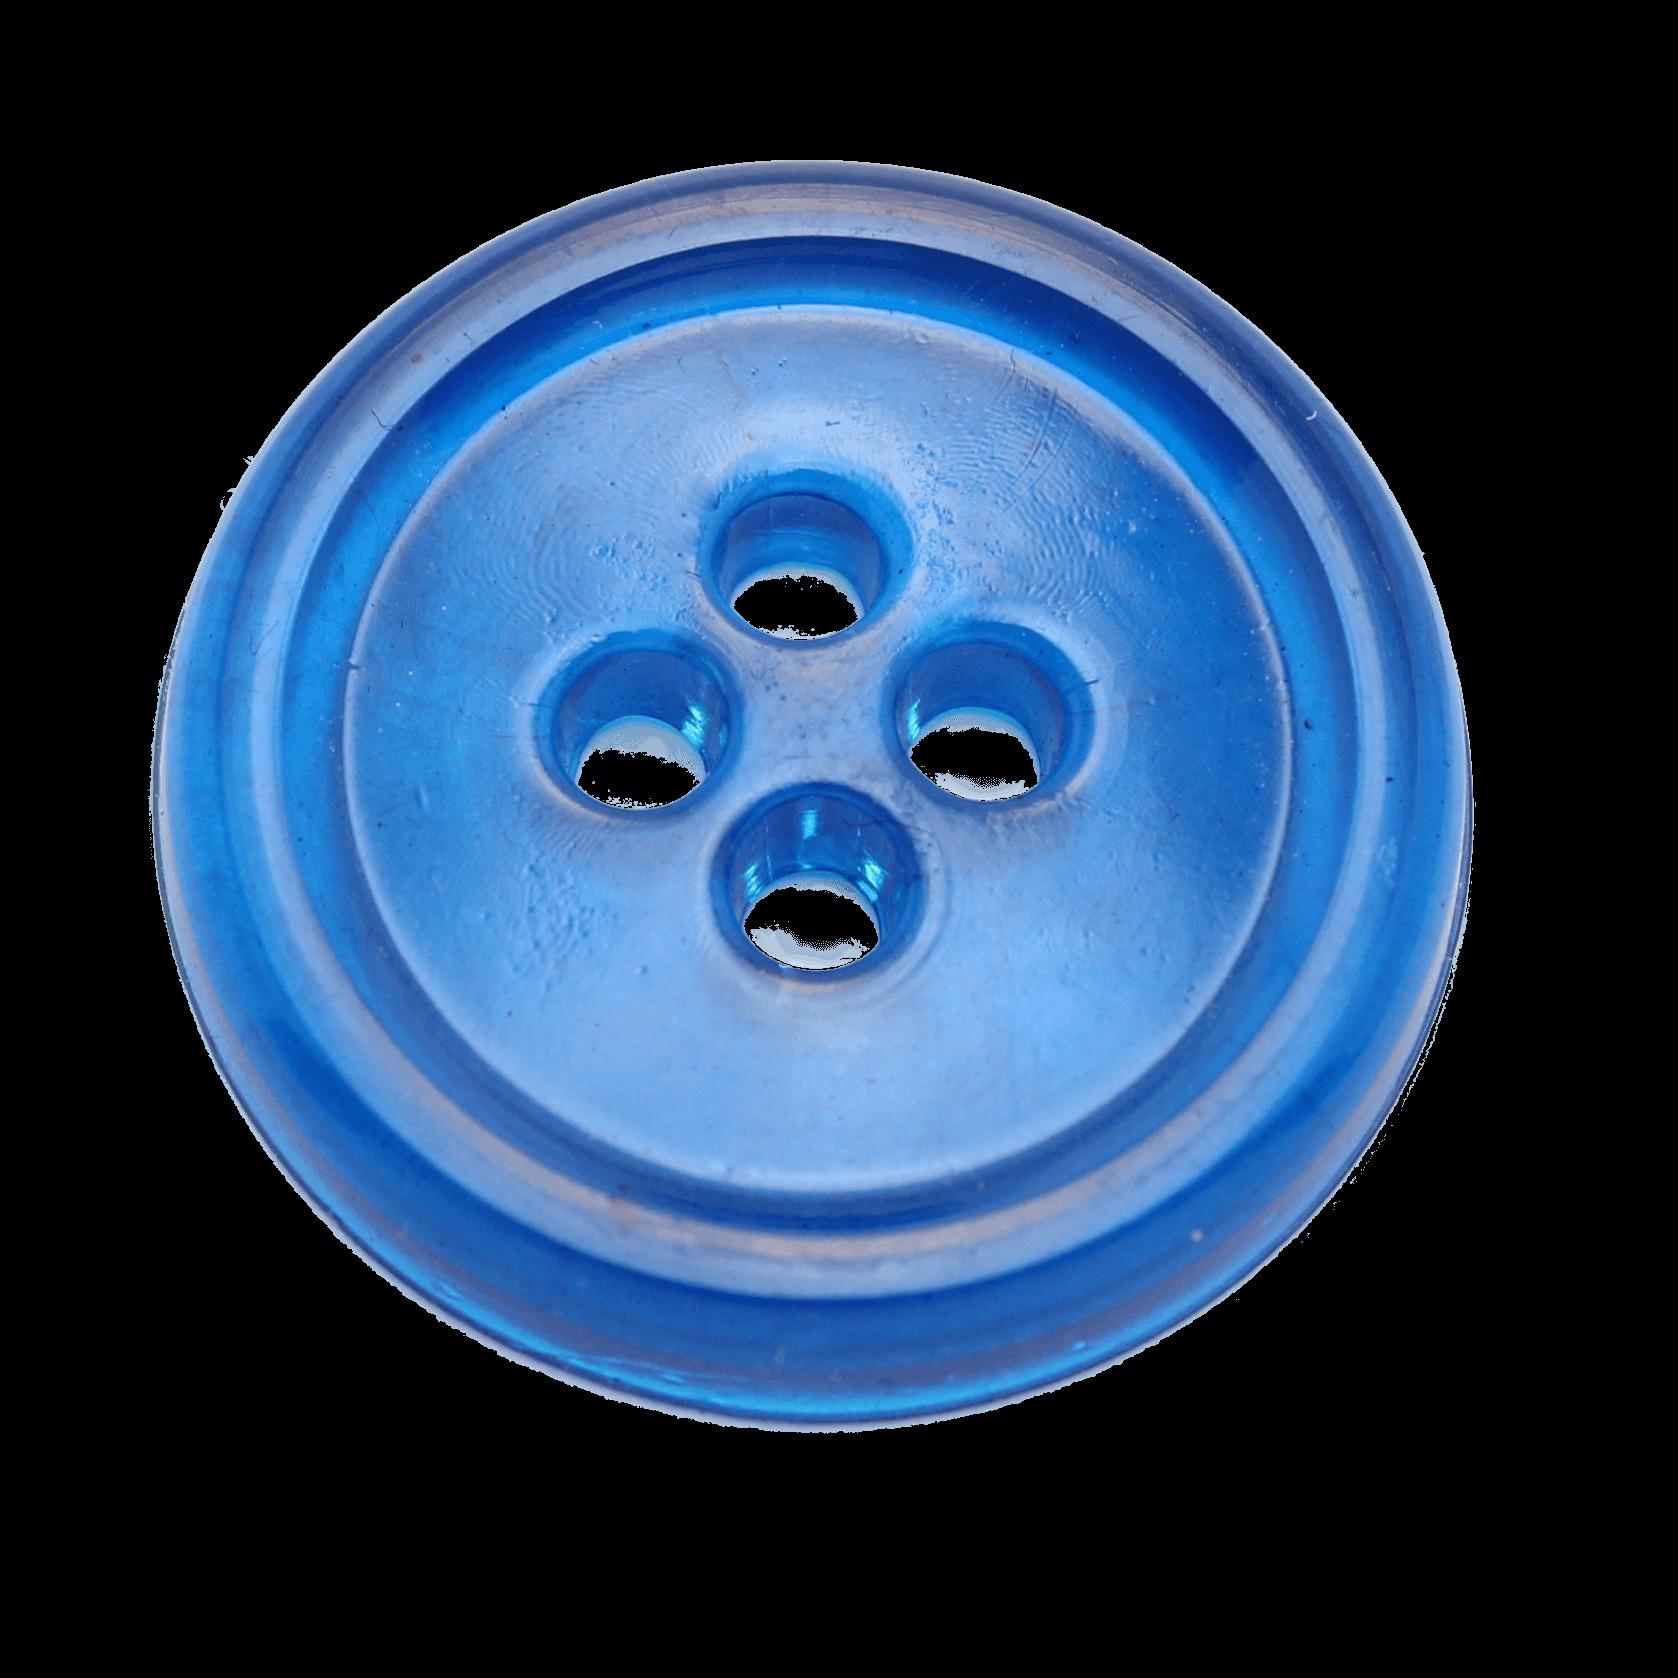 clip free stock Transparent buttons. Button clothes blue png